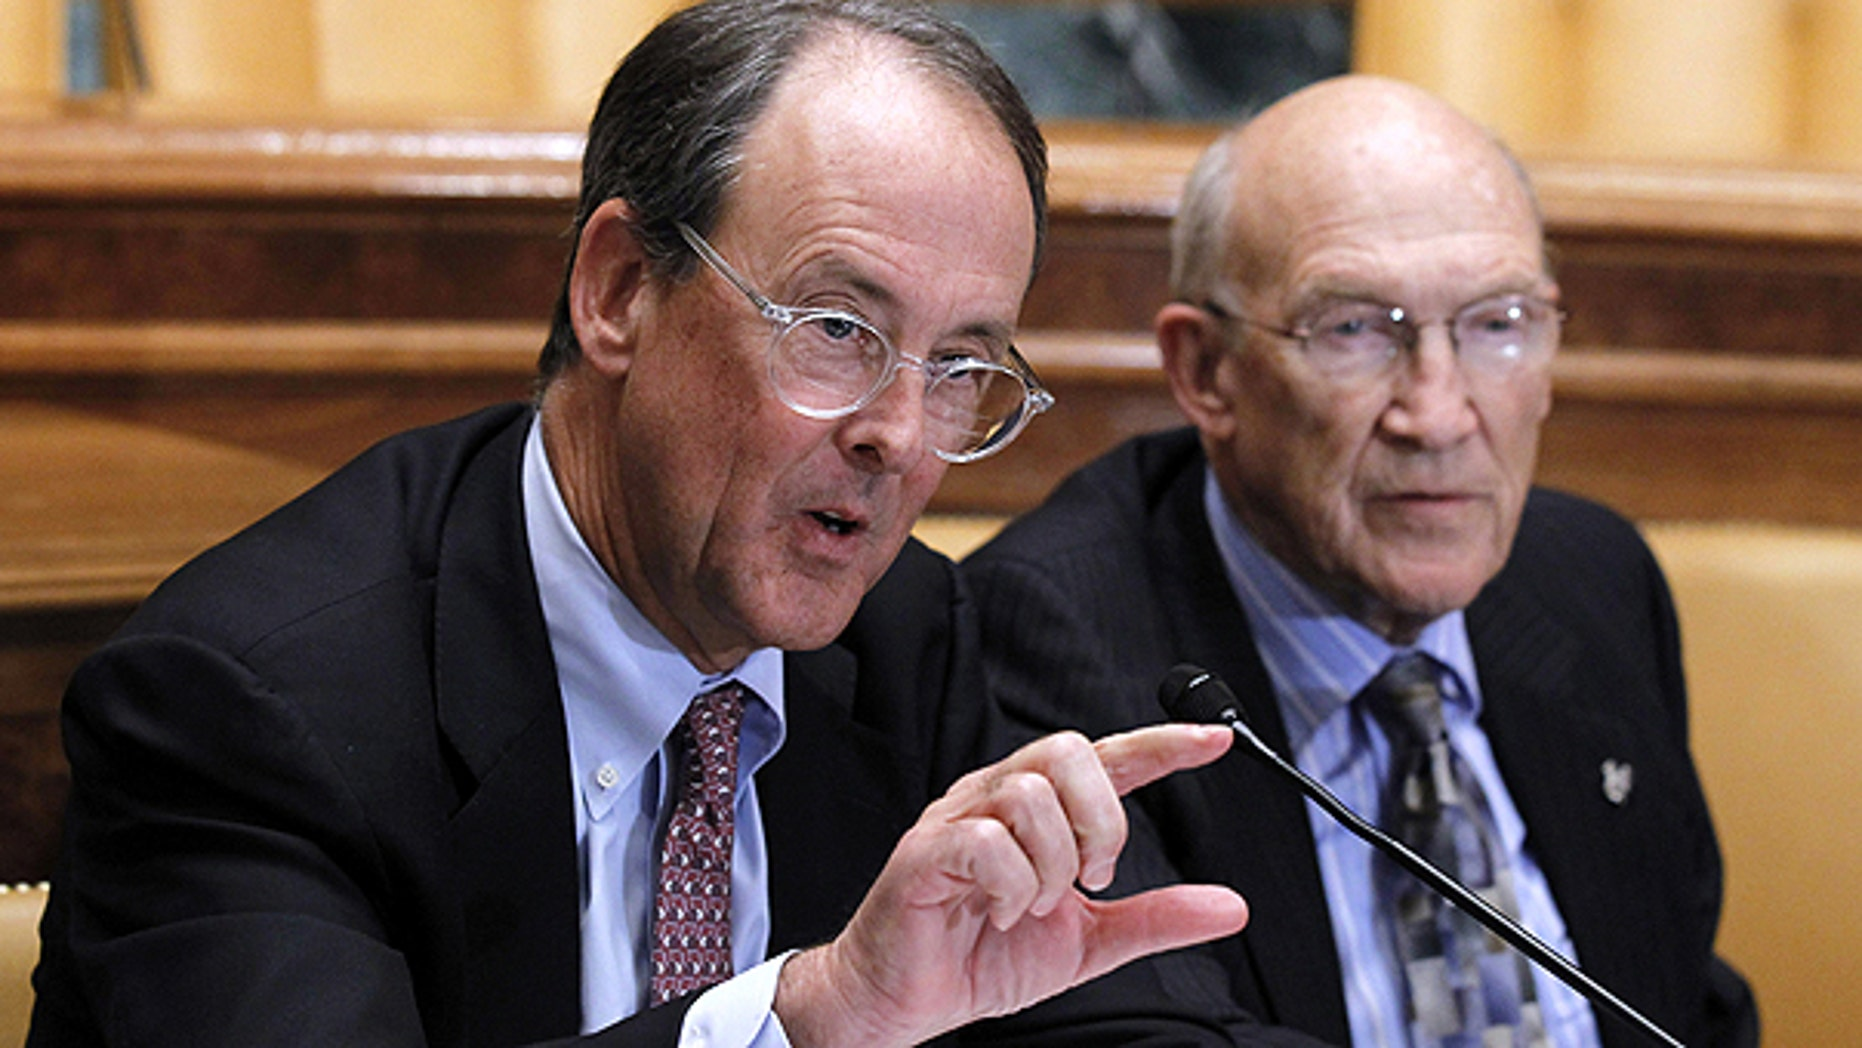 Nov. 10: Erskine Bowles, left, and former Wyoming Sen. Alan Simpson, co-chairmen of President Obama's bipartisan deficit commission, speaks on Capitol Hill.